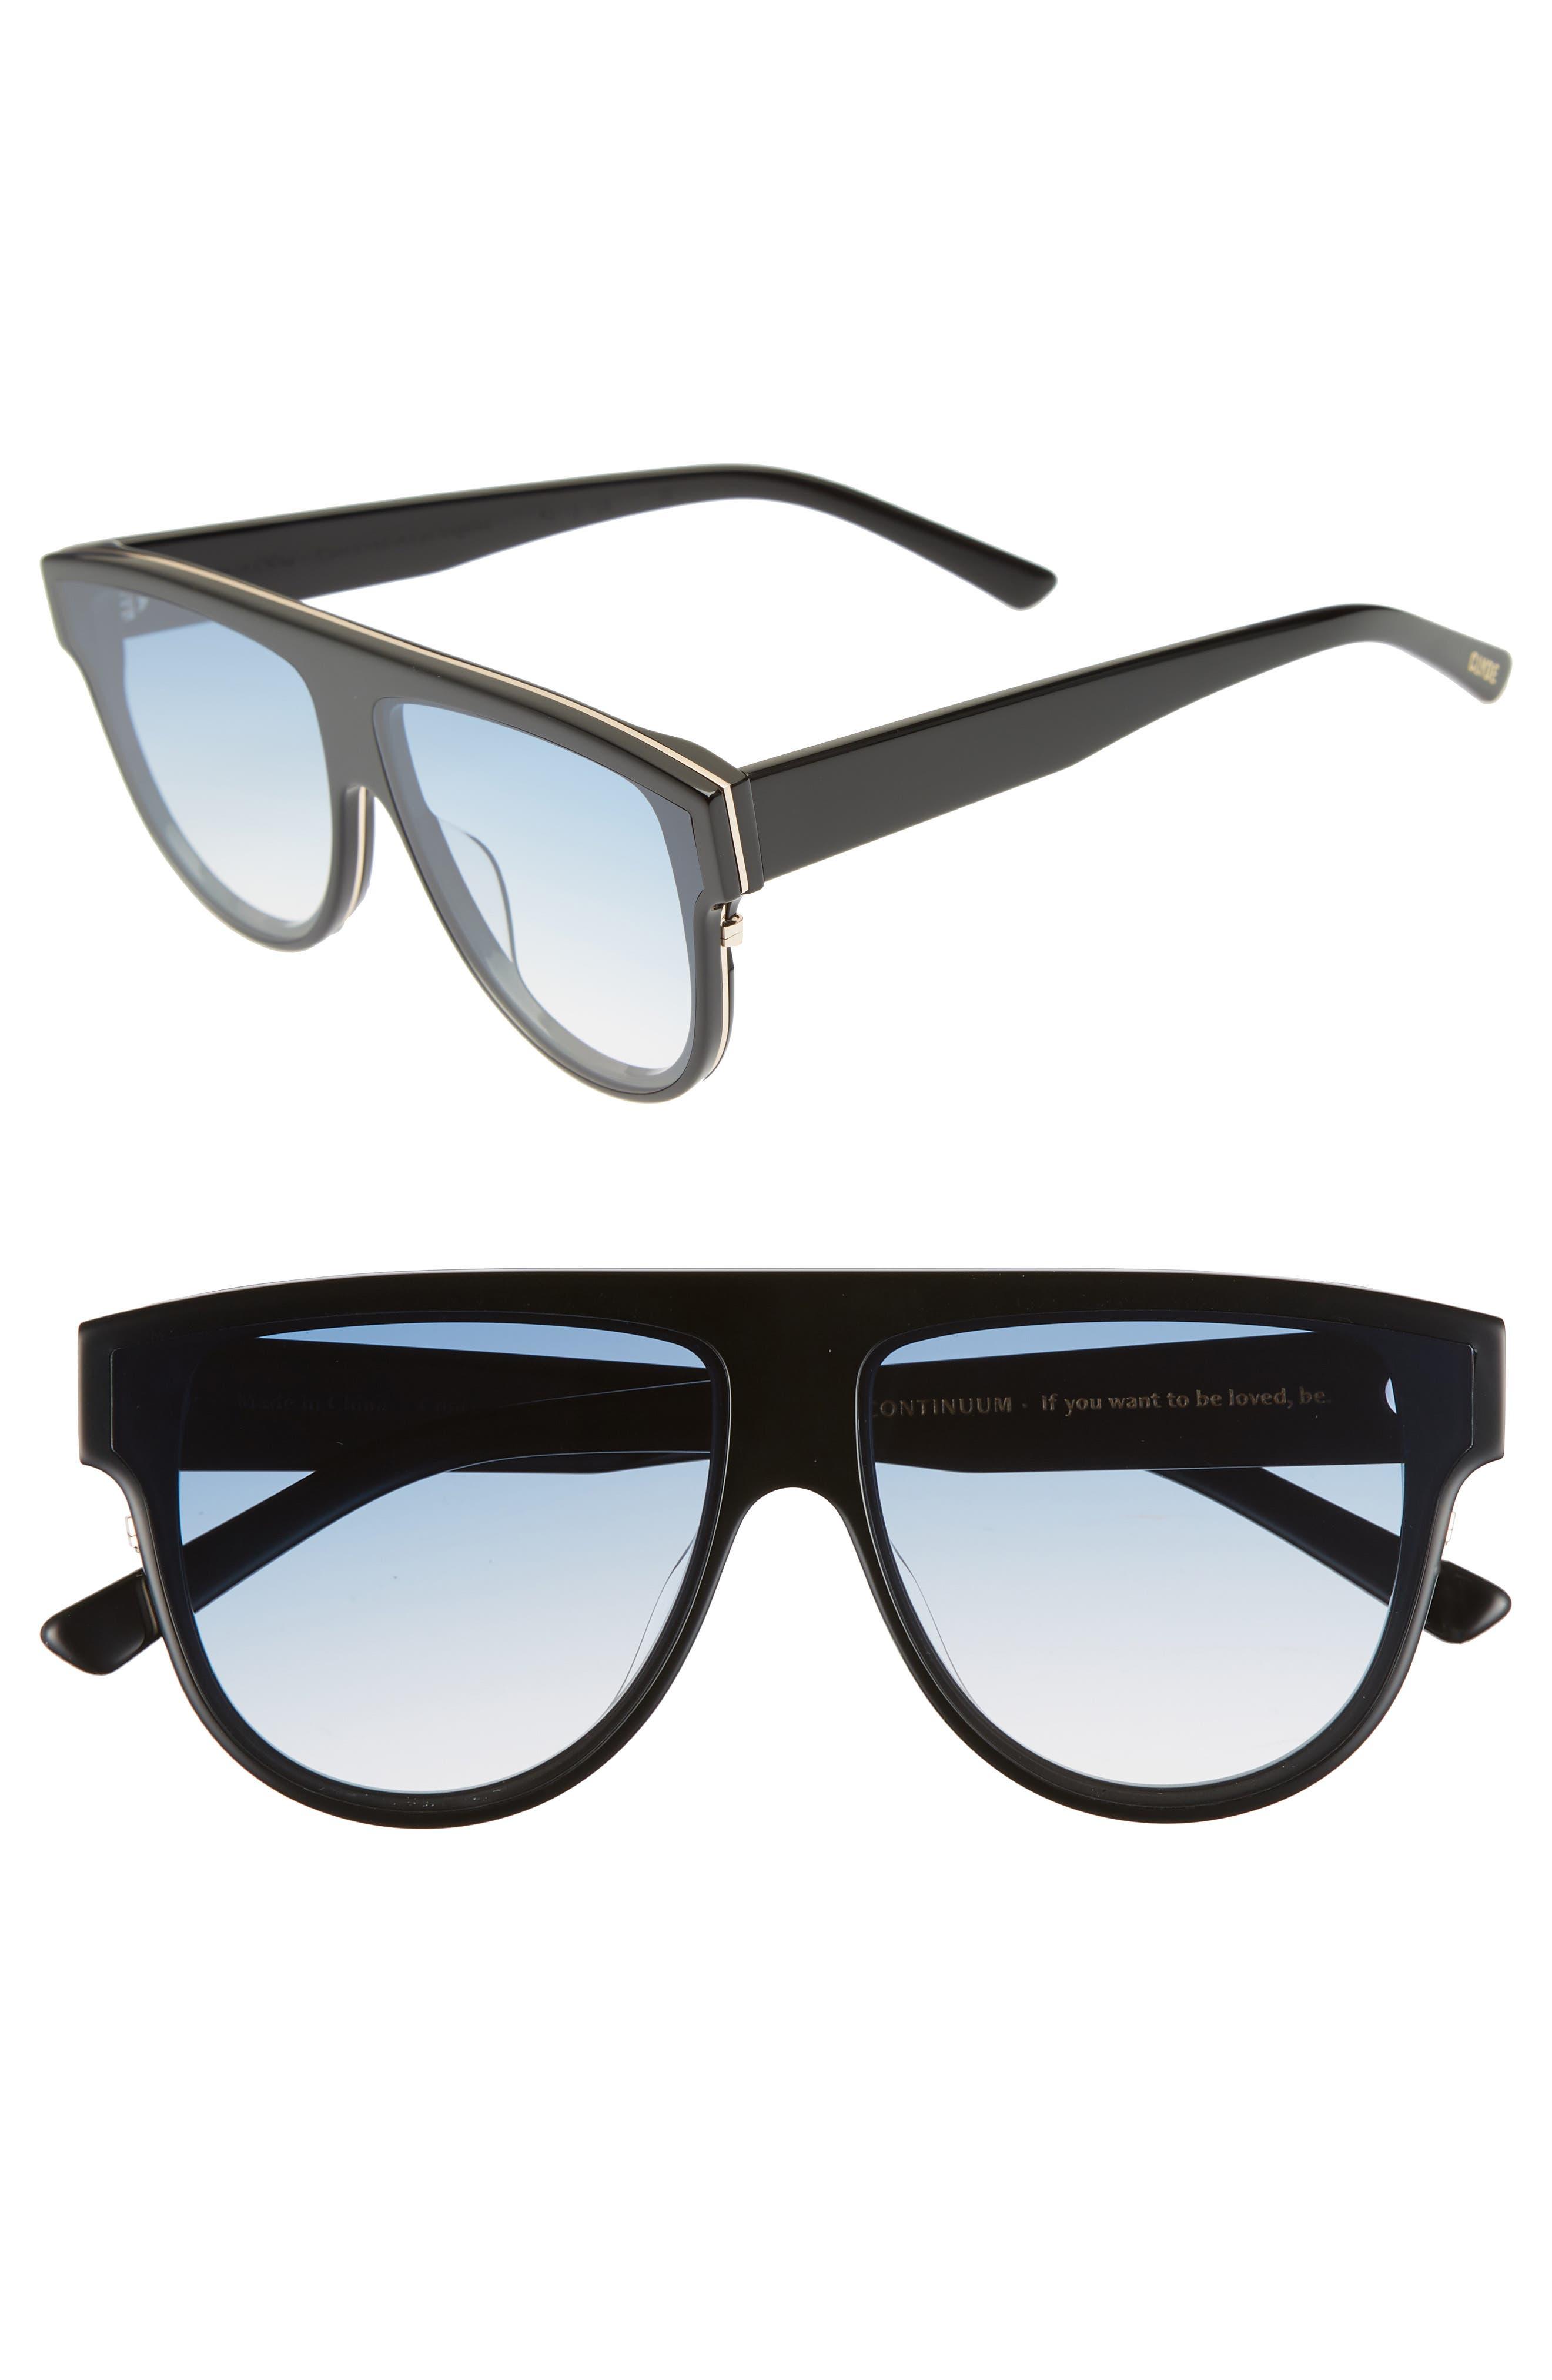 Continuum 63mm Oversize Flat Top Sunglasses,                         Main,                         color, Blue Gradient